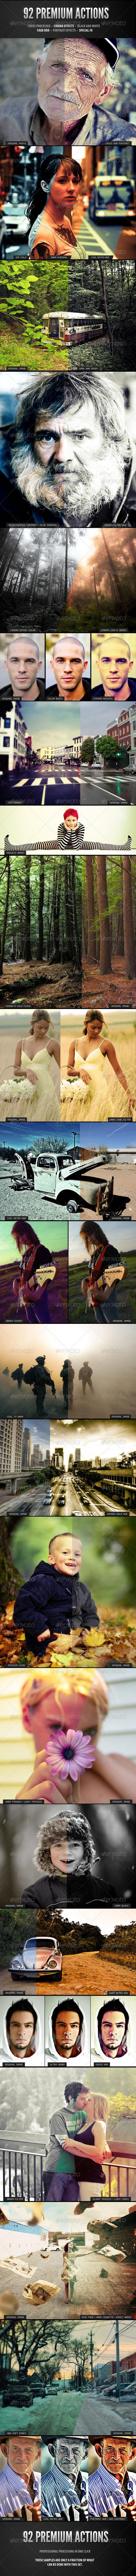 GraphicRiver 92 Premium Photoshop Actions Set 2343094